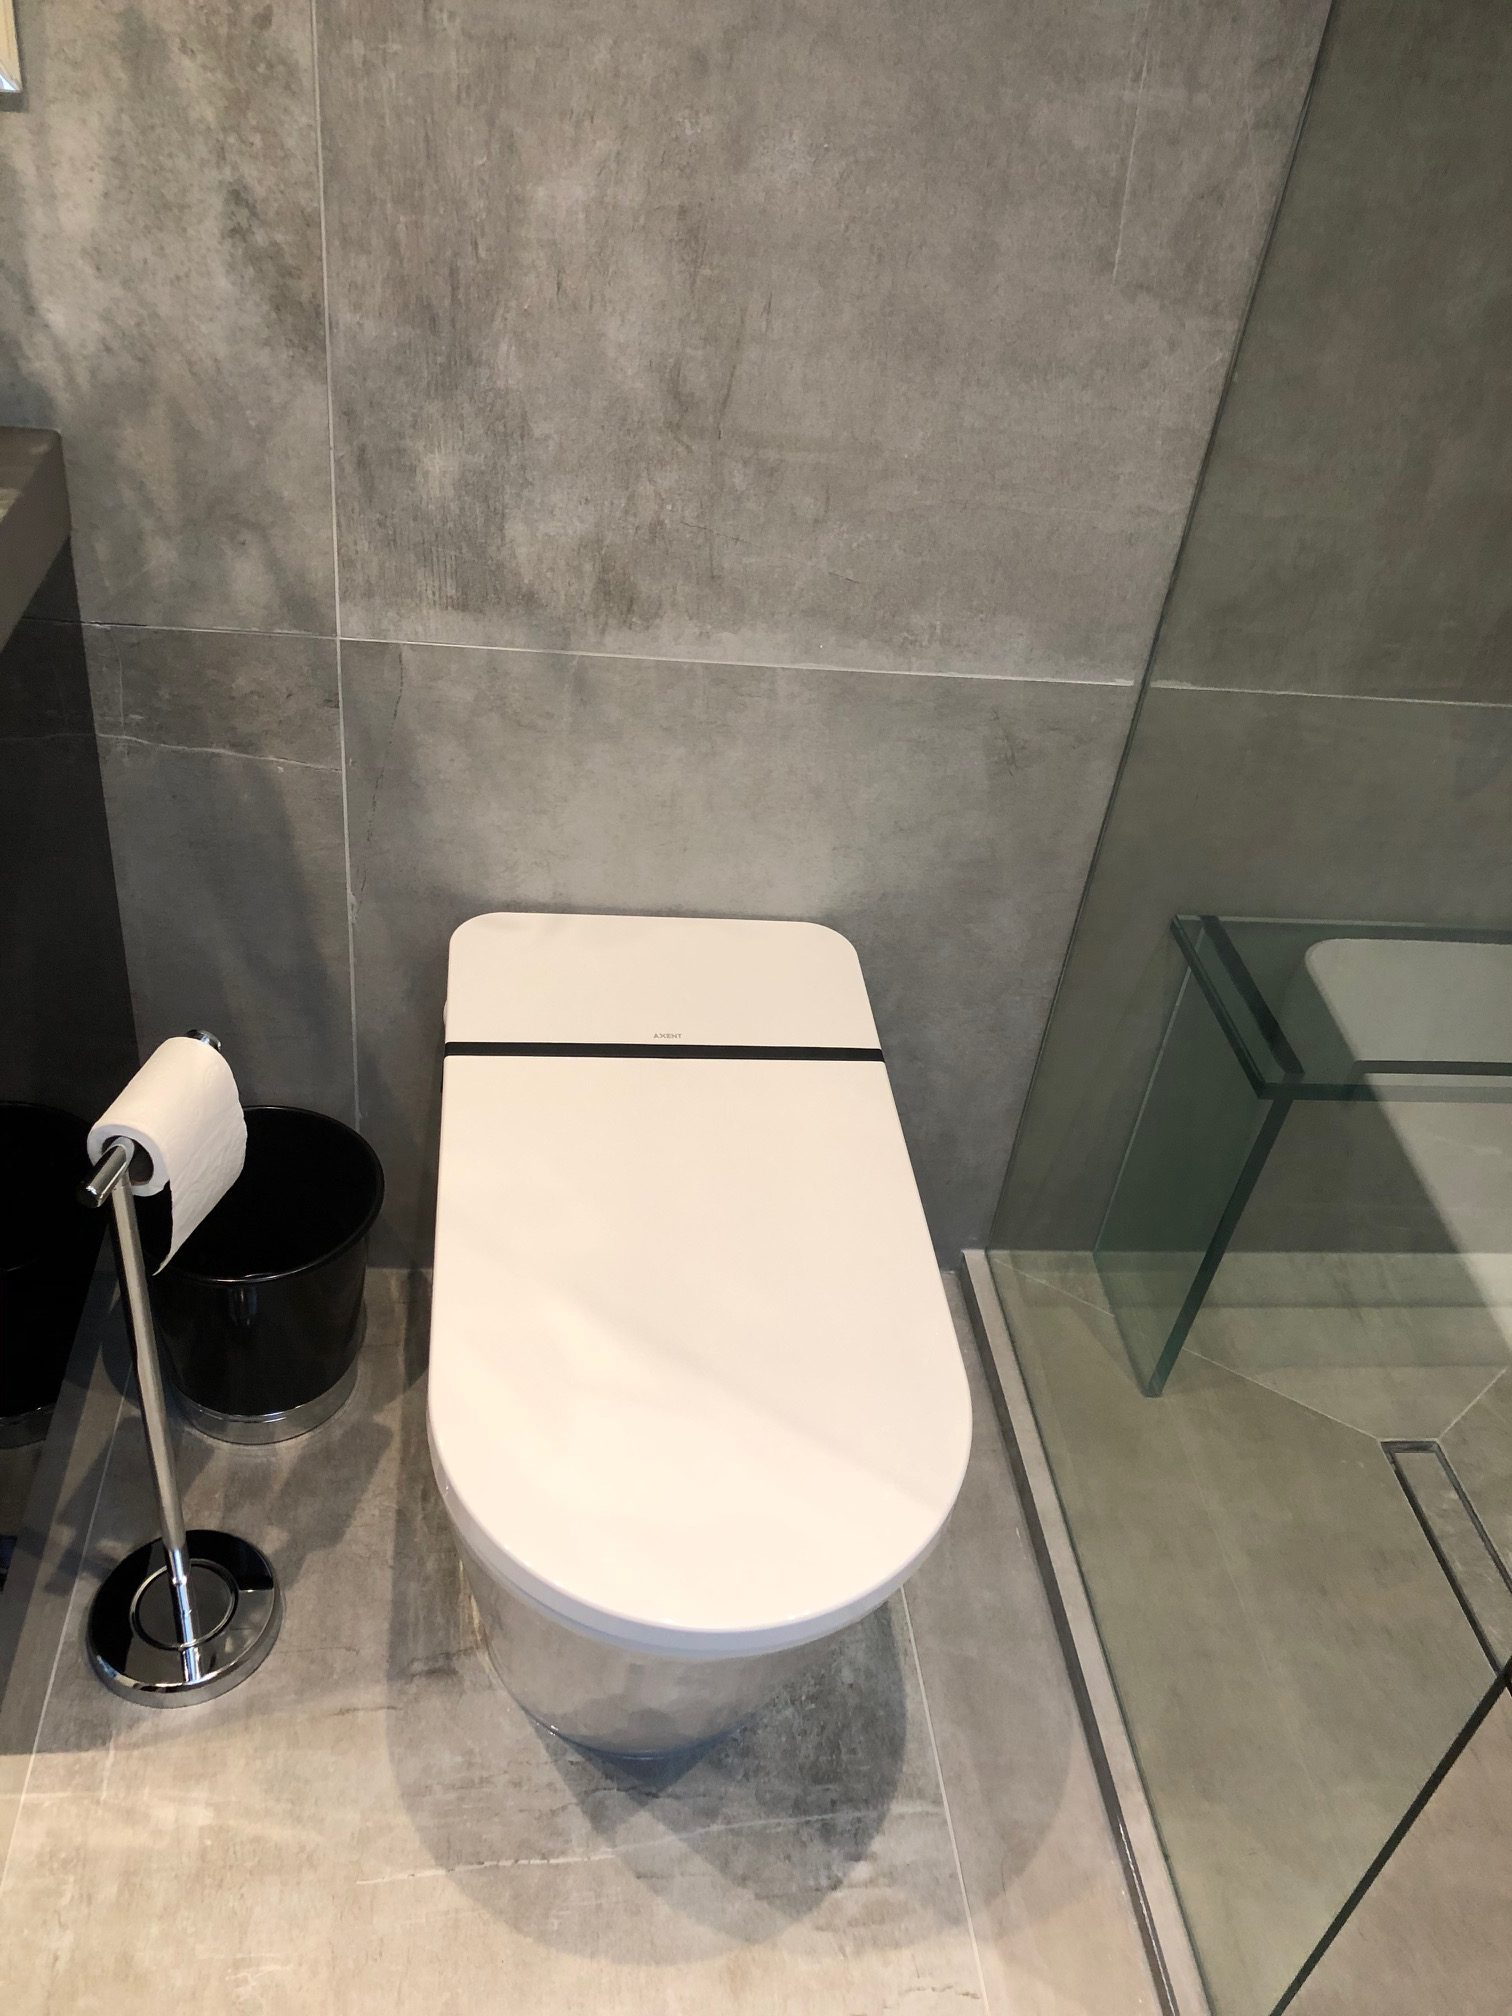 Shower, Wall & Floor: StoneOne Dark